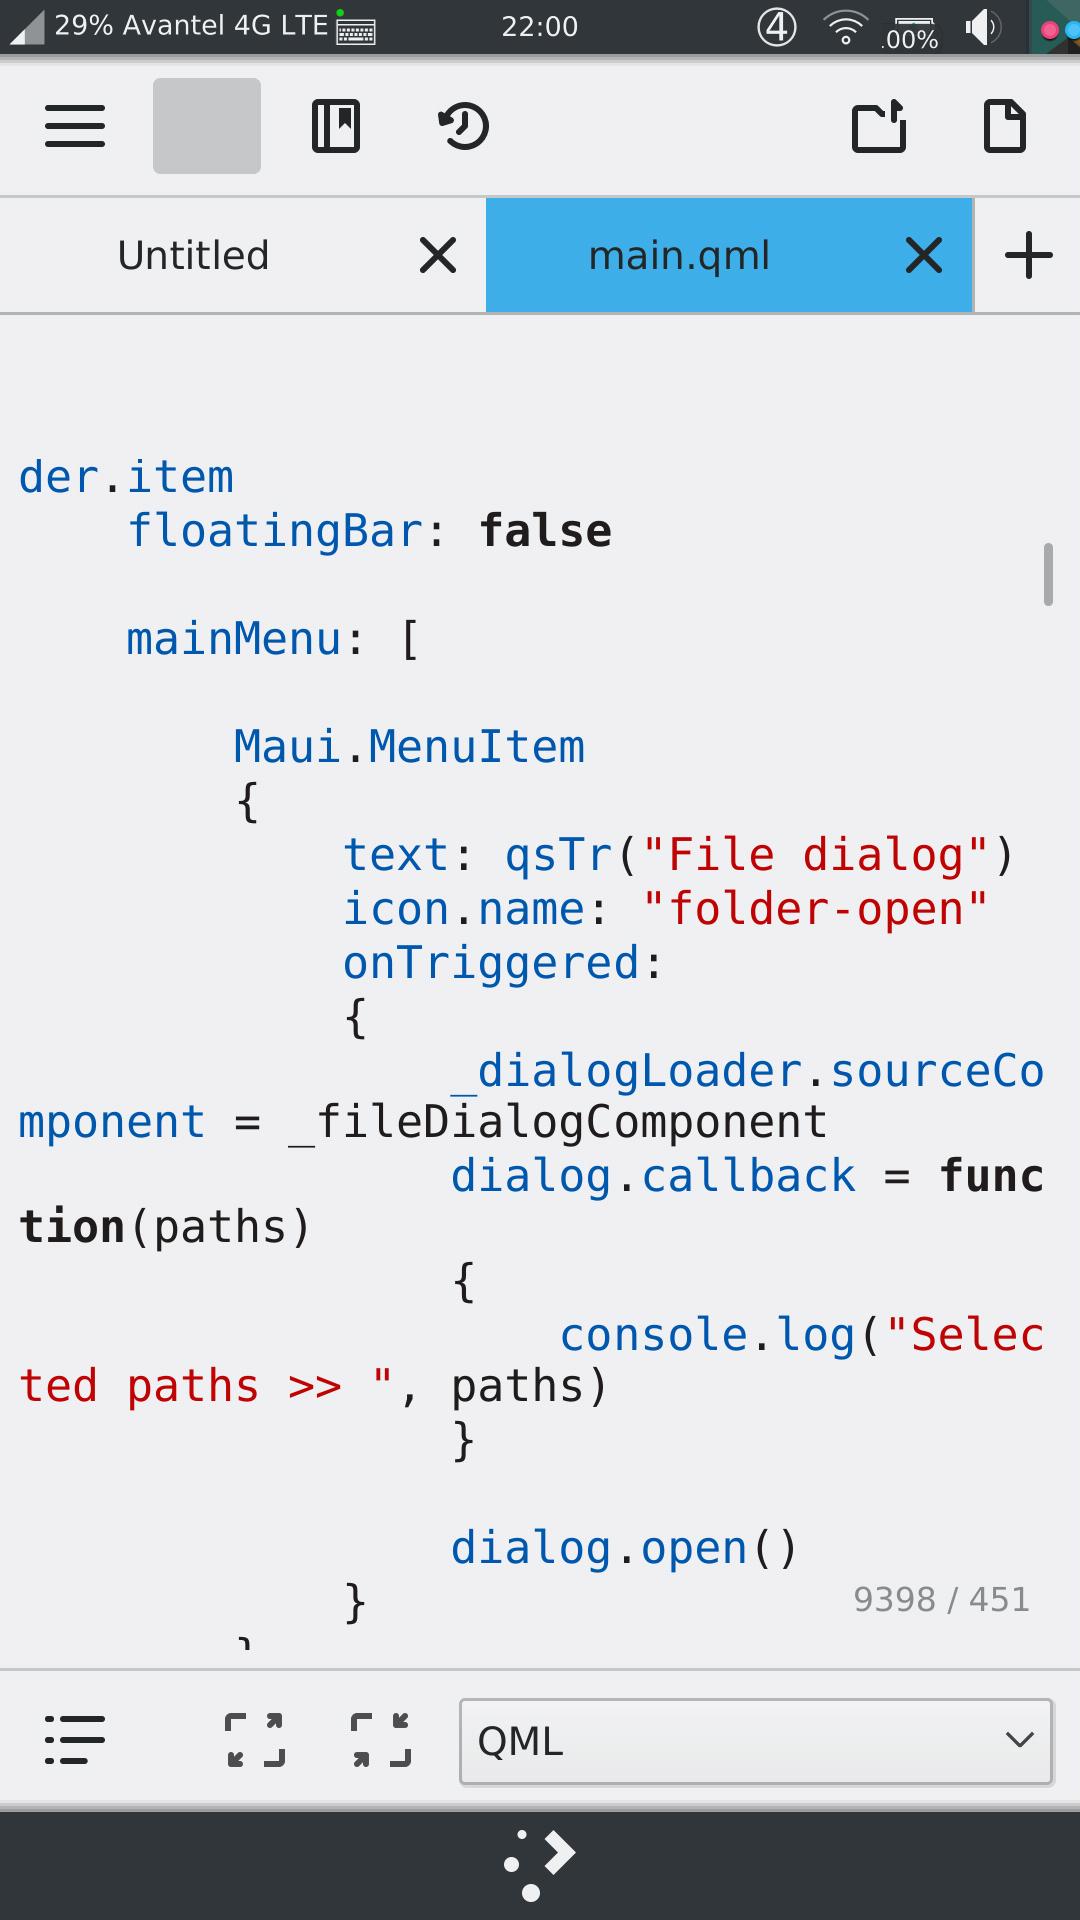 img/screenshots/nota-file-editor.png